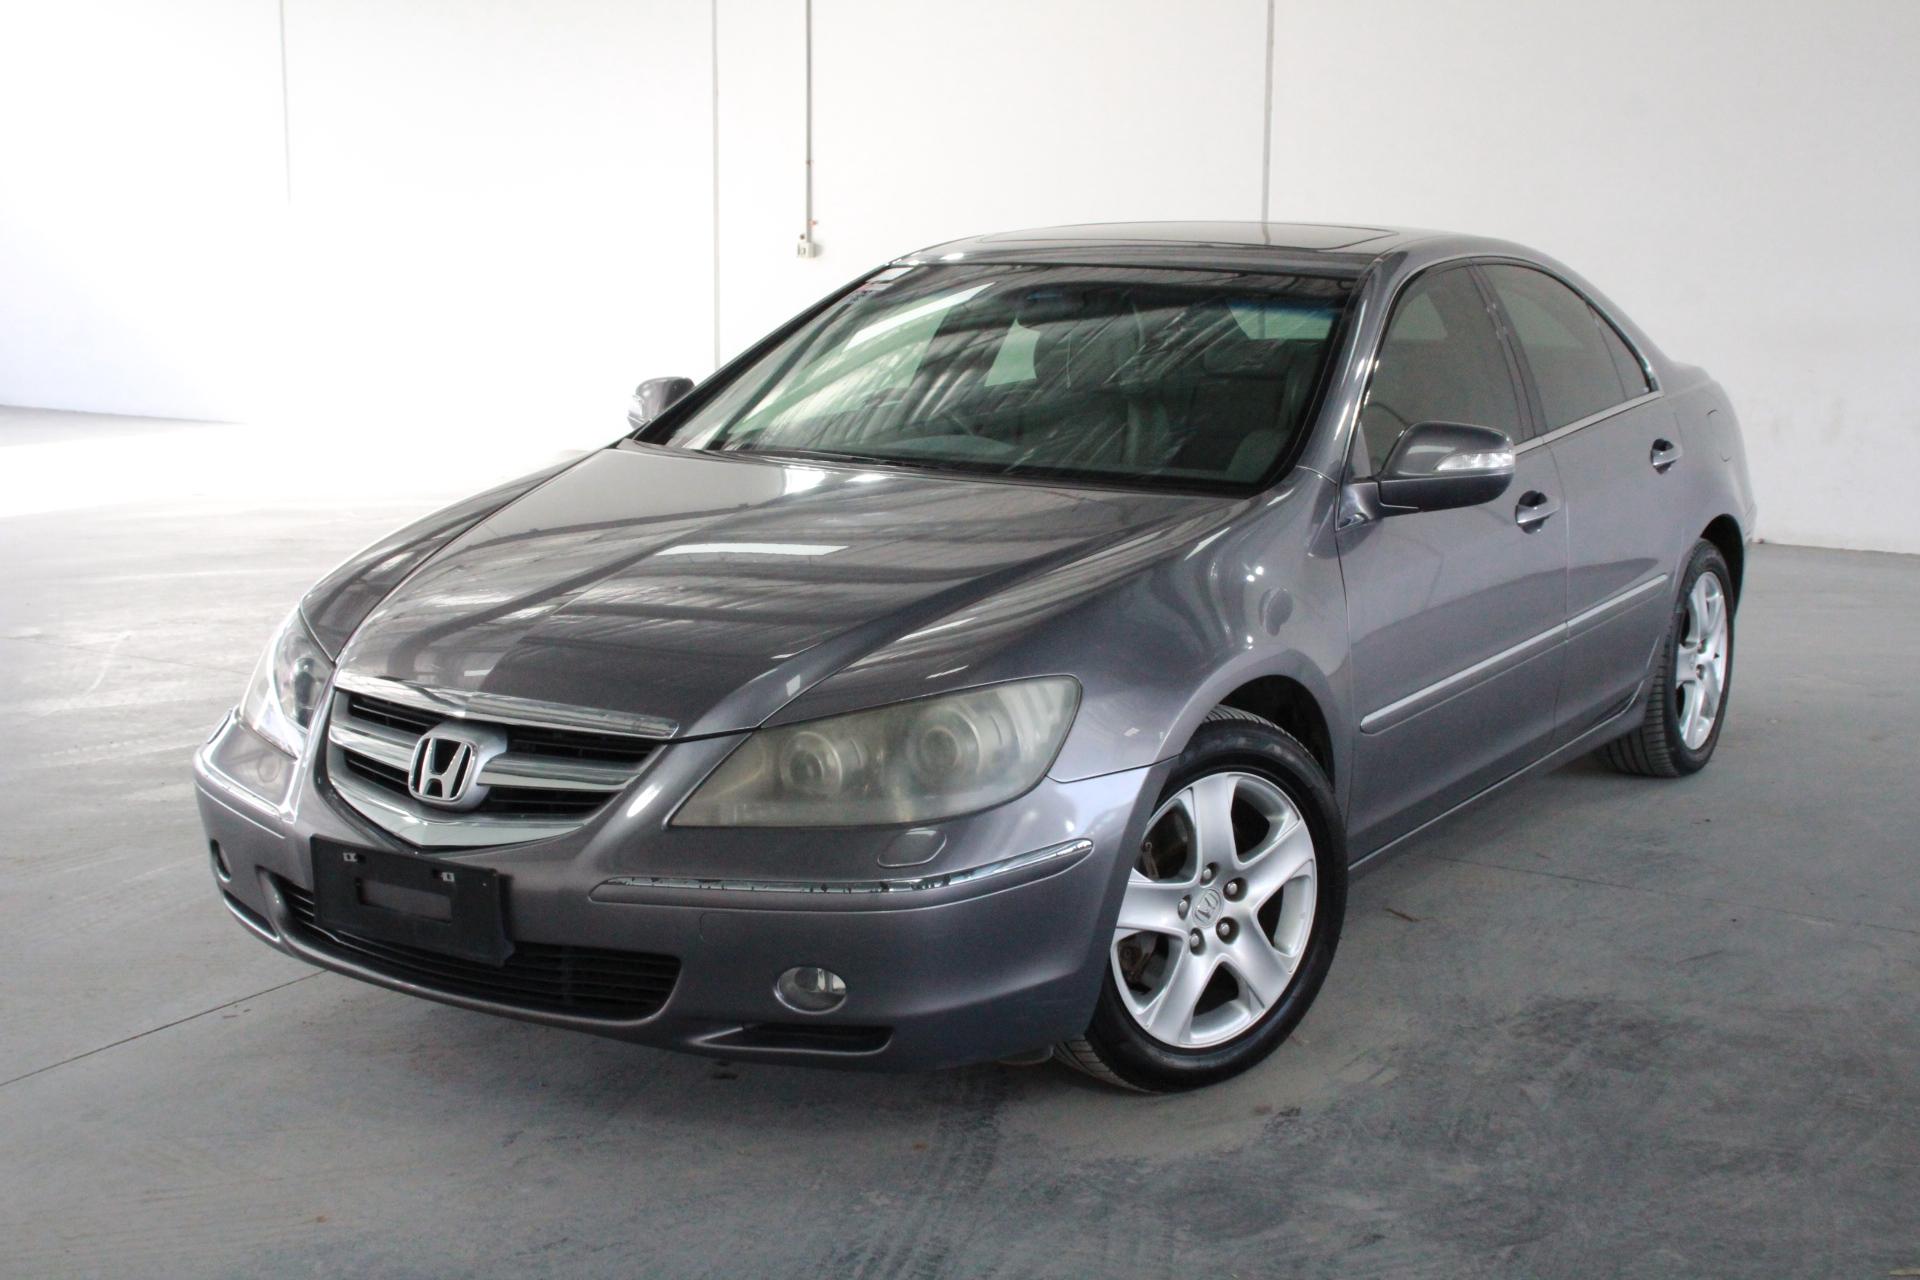 2007 Honda Legend Automatic Sedan